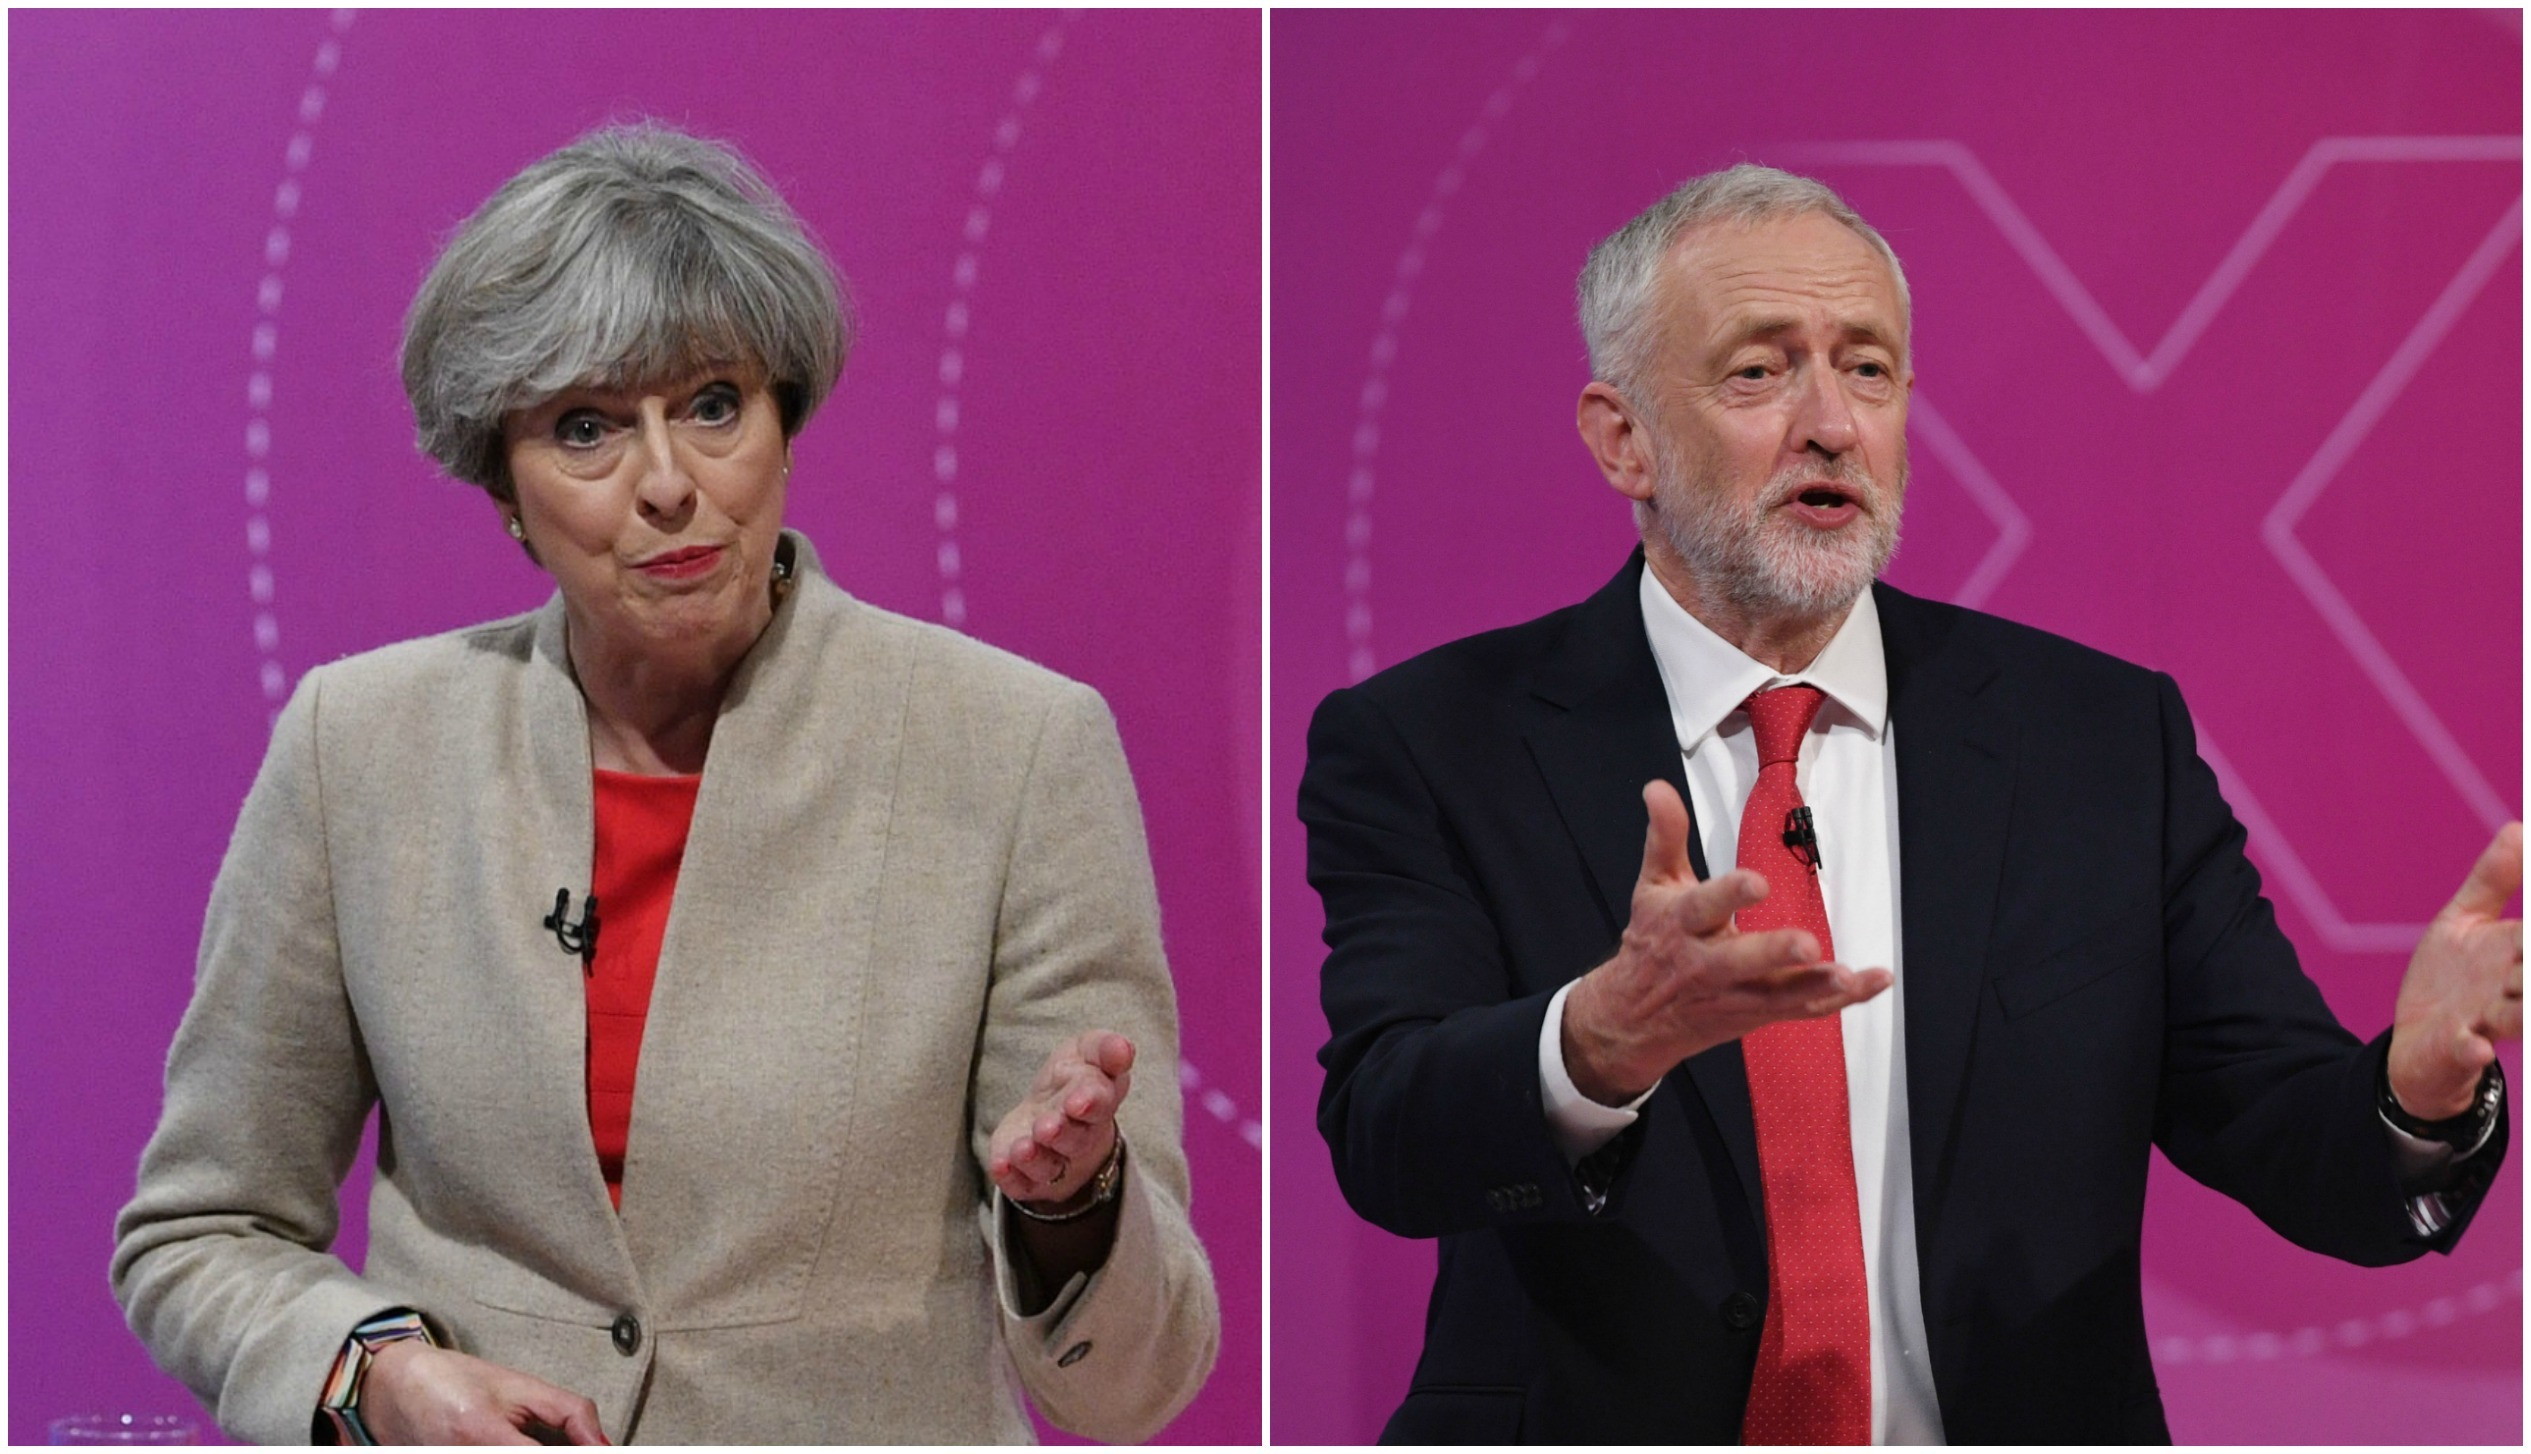 May and Corbyn at an election TV debate